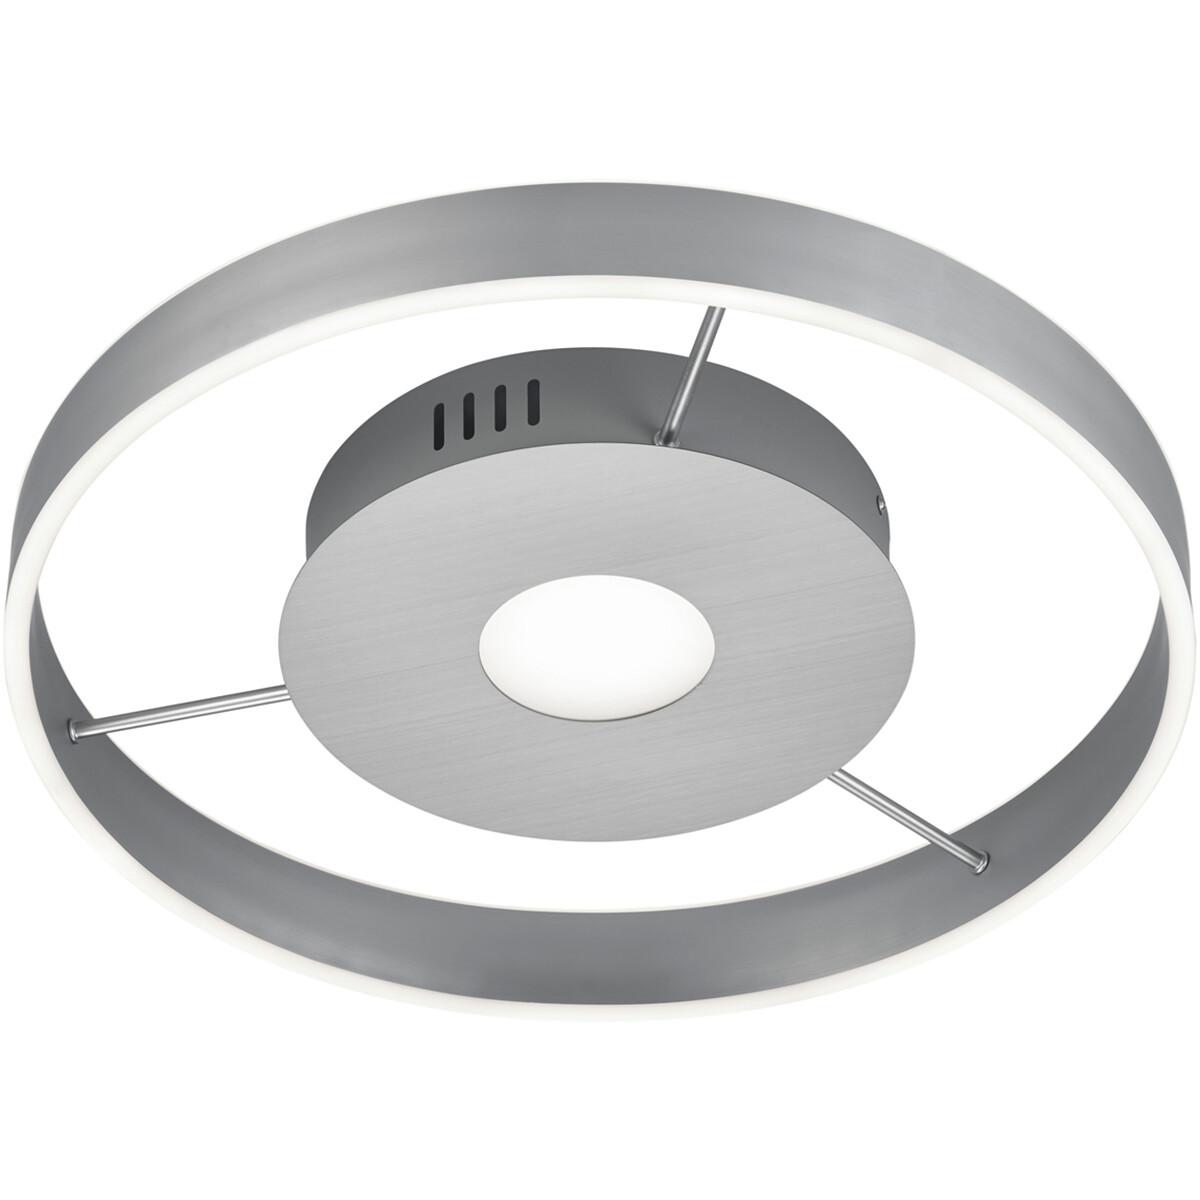 LED Plafondlamp - Plafondverlichting - Trion Lonag - 45W - Aanpasbare Kleur - Rond - Mat Nikkel - Al